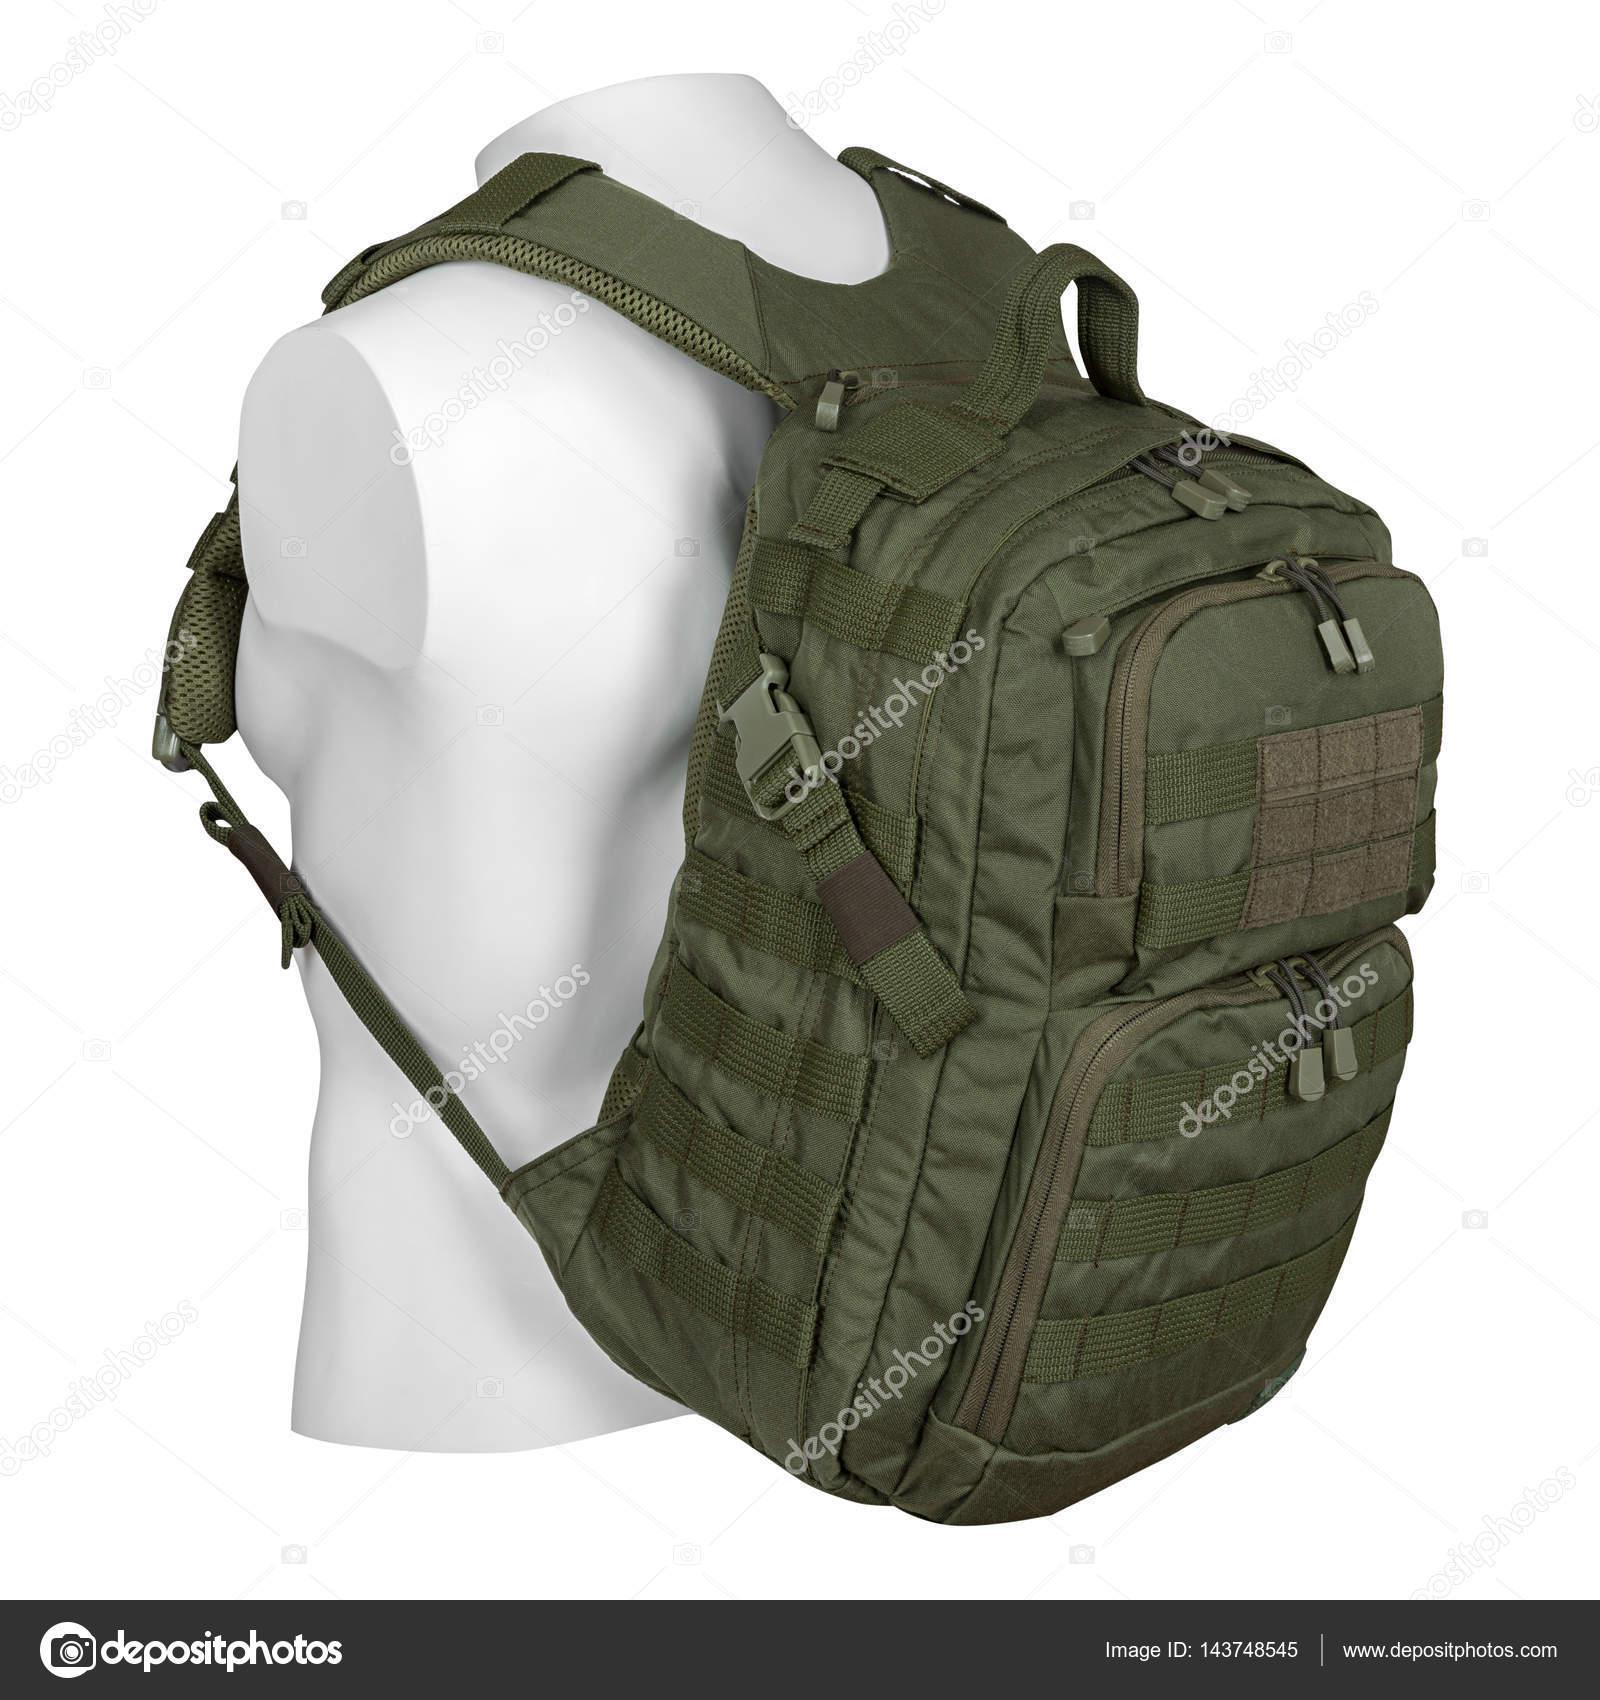 eb2e2d435b Στρατιωτική τσάντα